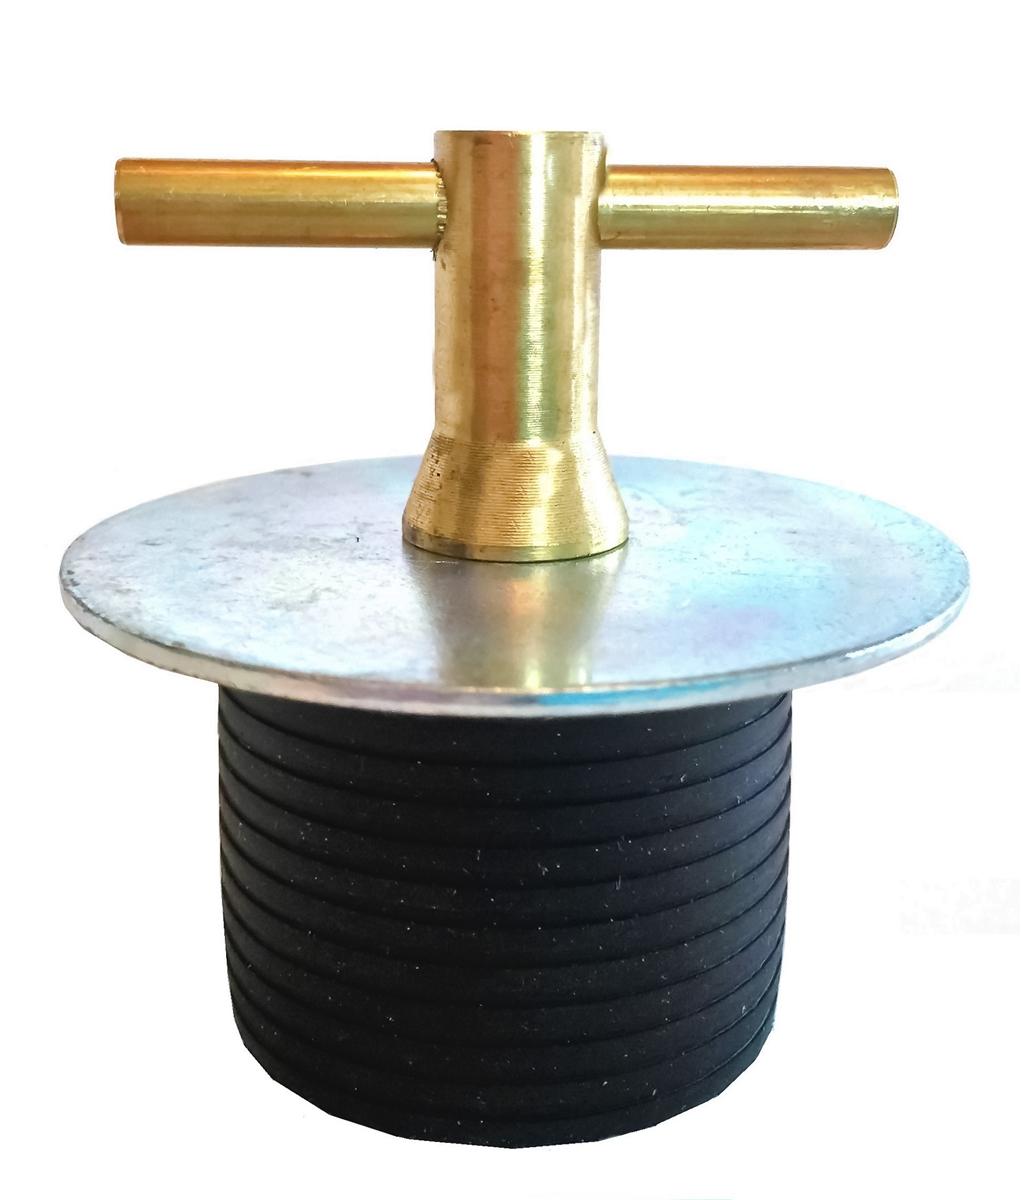 Pipe Plug Mechanical T Handle Rubber 2 7 8 Quot Dia